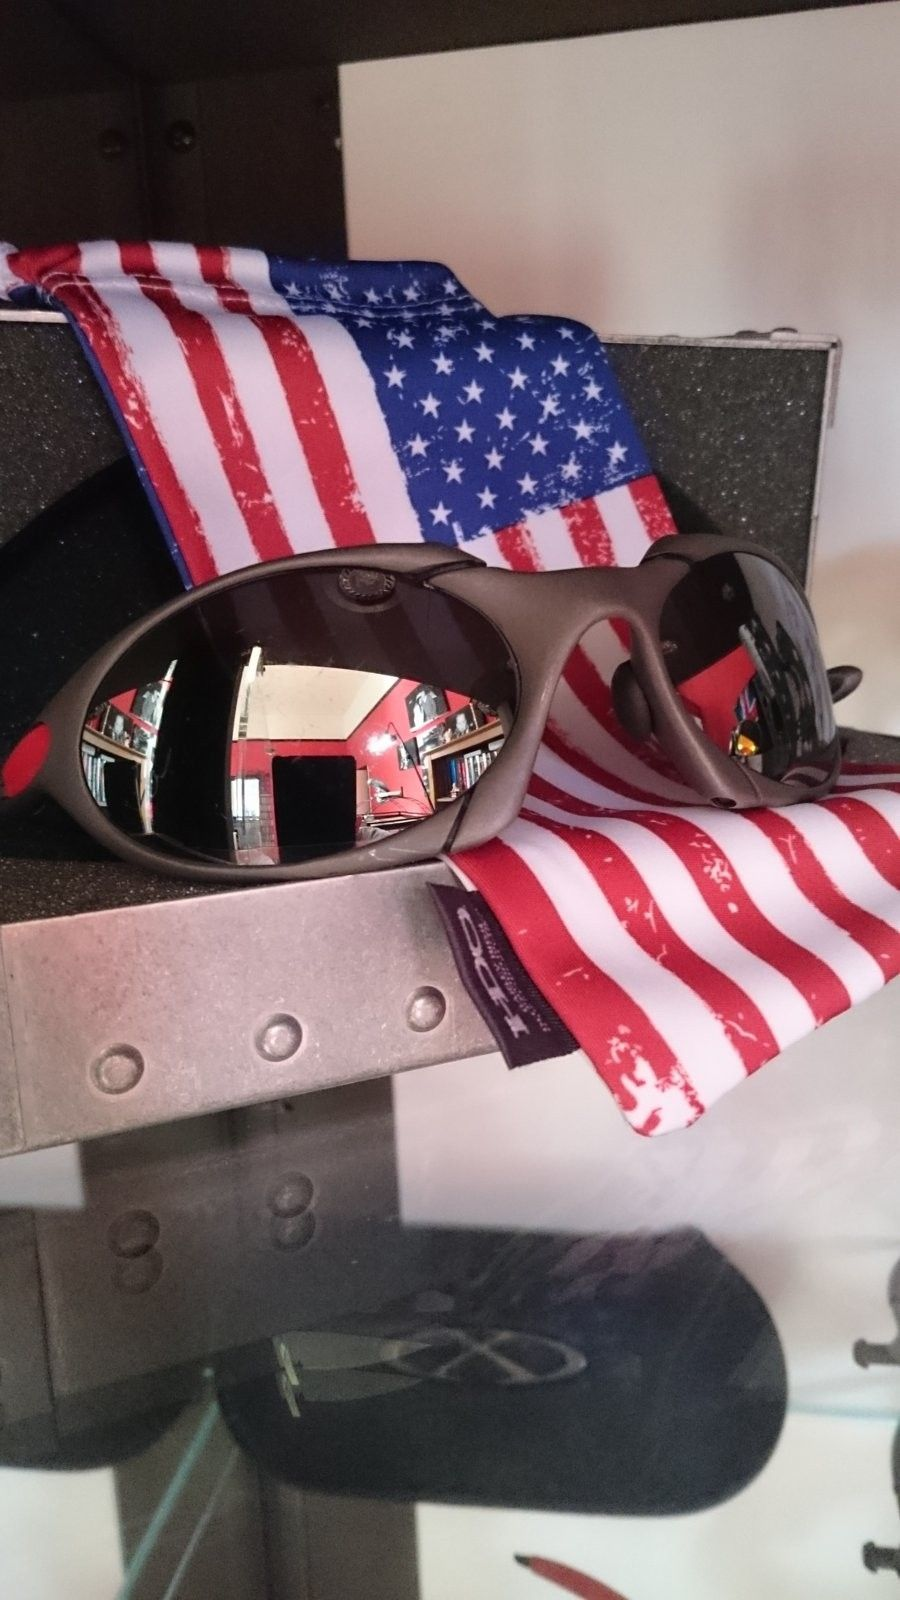 X-metal R1 with 2 sets of OEM lenses - DSC_0048.JPG